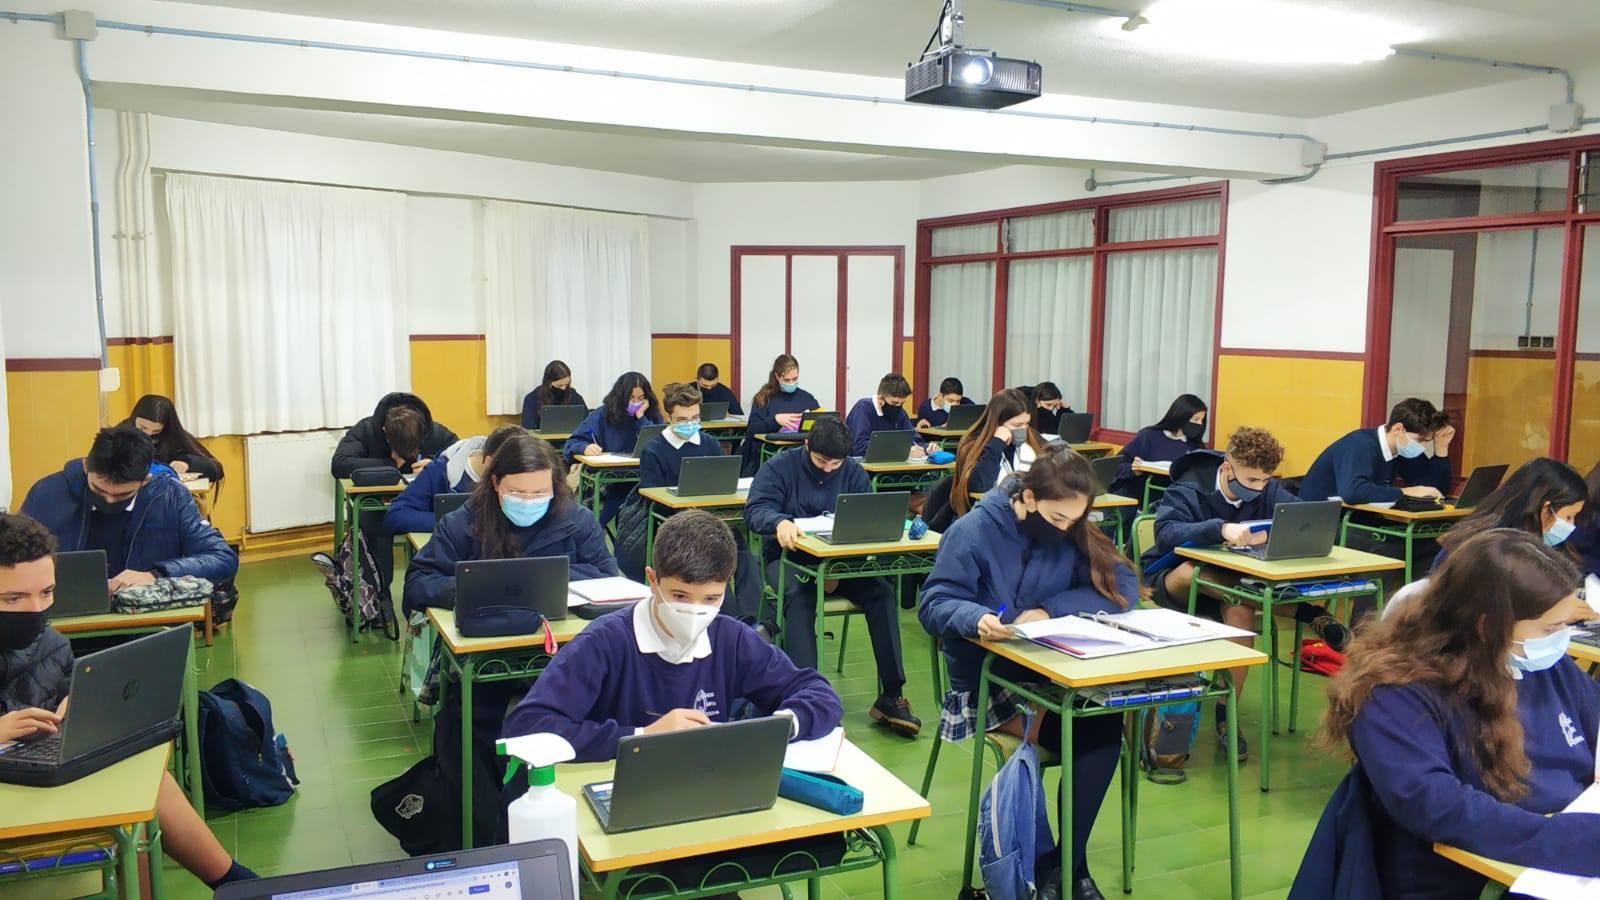 Colegio La Grande Obra De Atocha Acest film nu are sinopsis. www lagrandeobradeatocha com